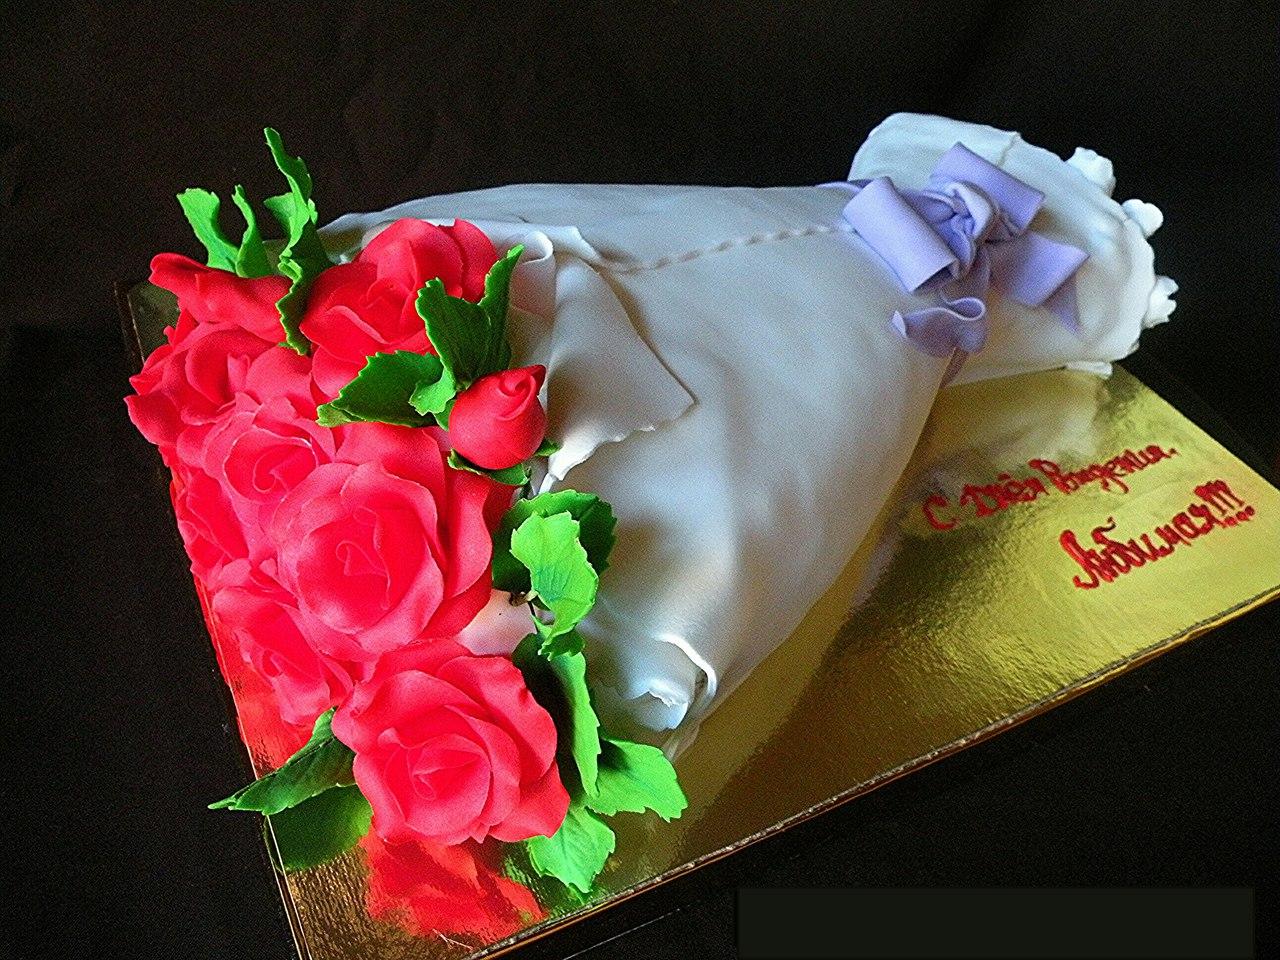 картинки торт в виде букета роз время имидж